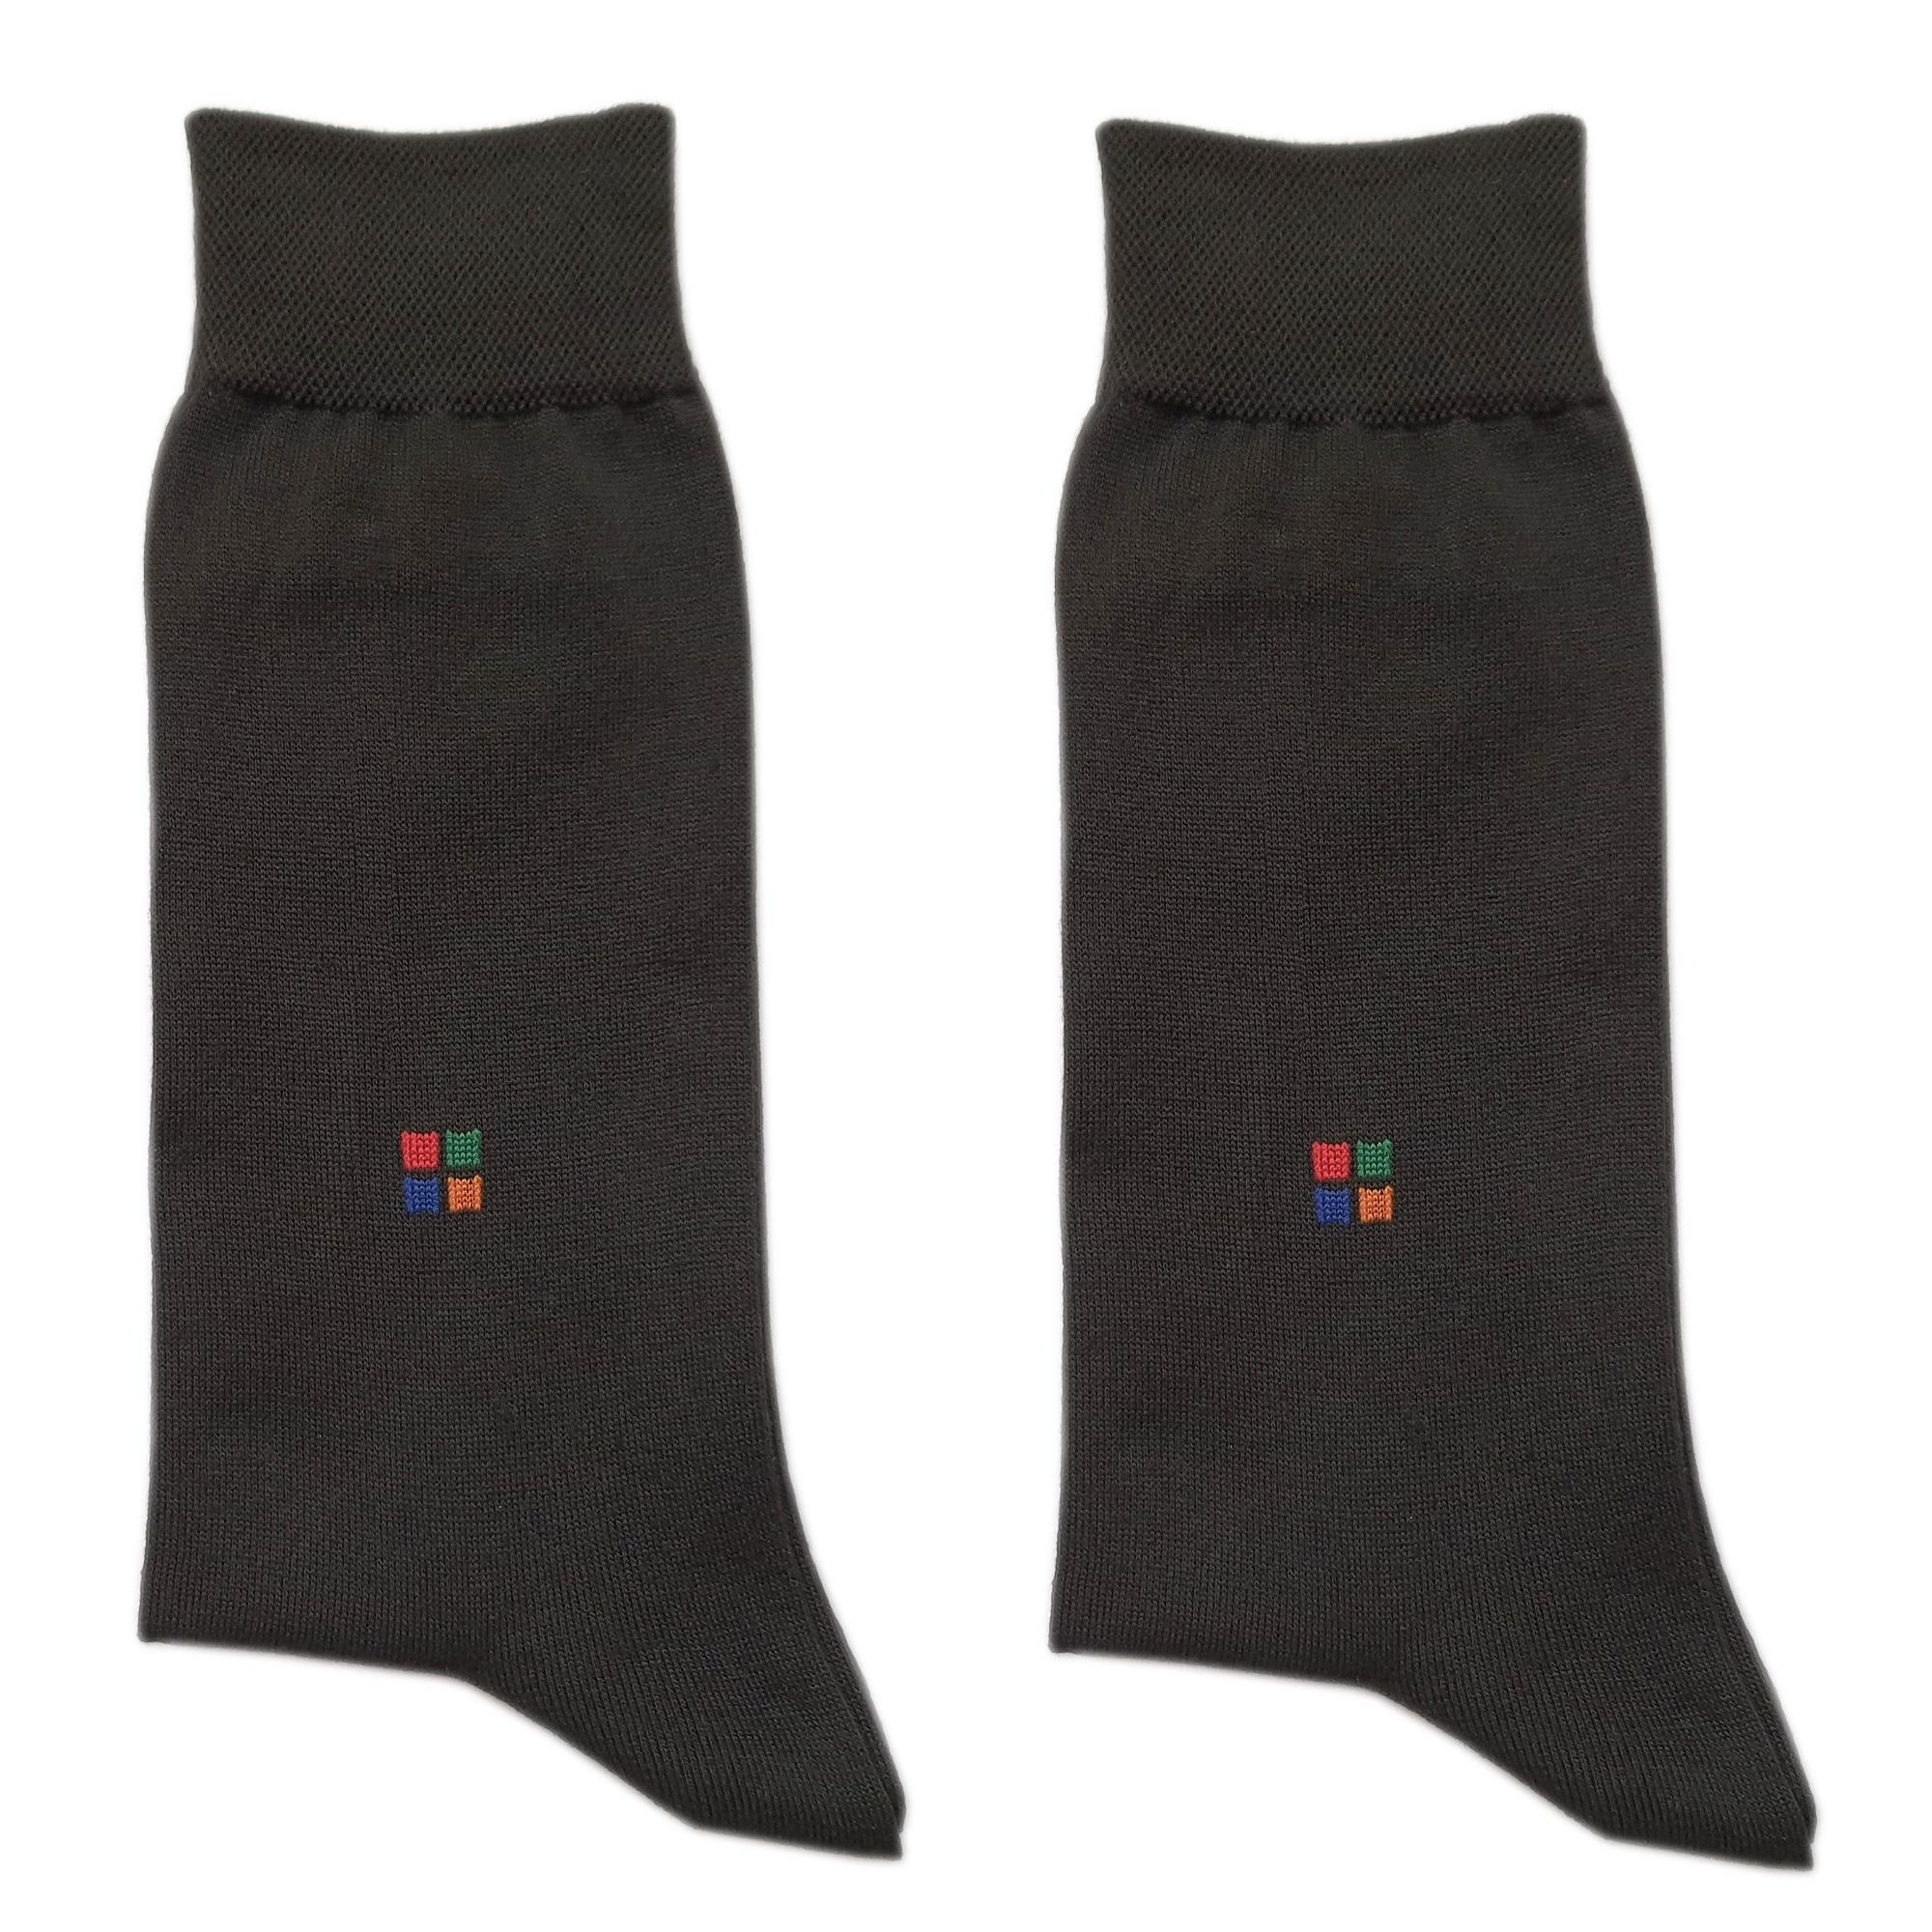 جوراب مردانه کد R305 بسته 2 عددی